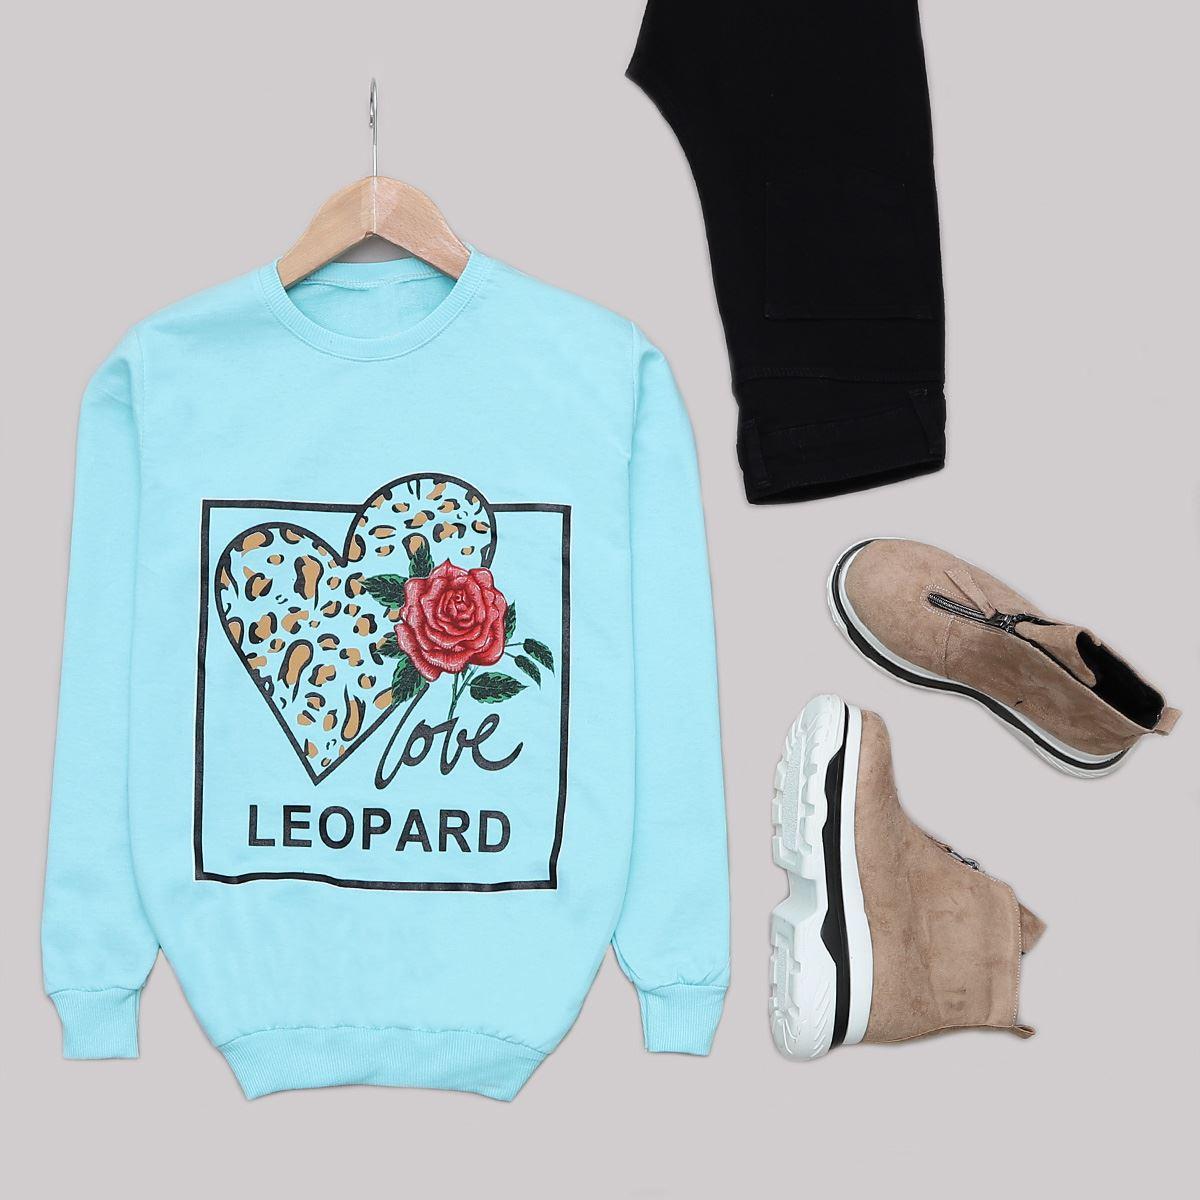 Mavi Leopar Sweat SWT458